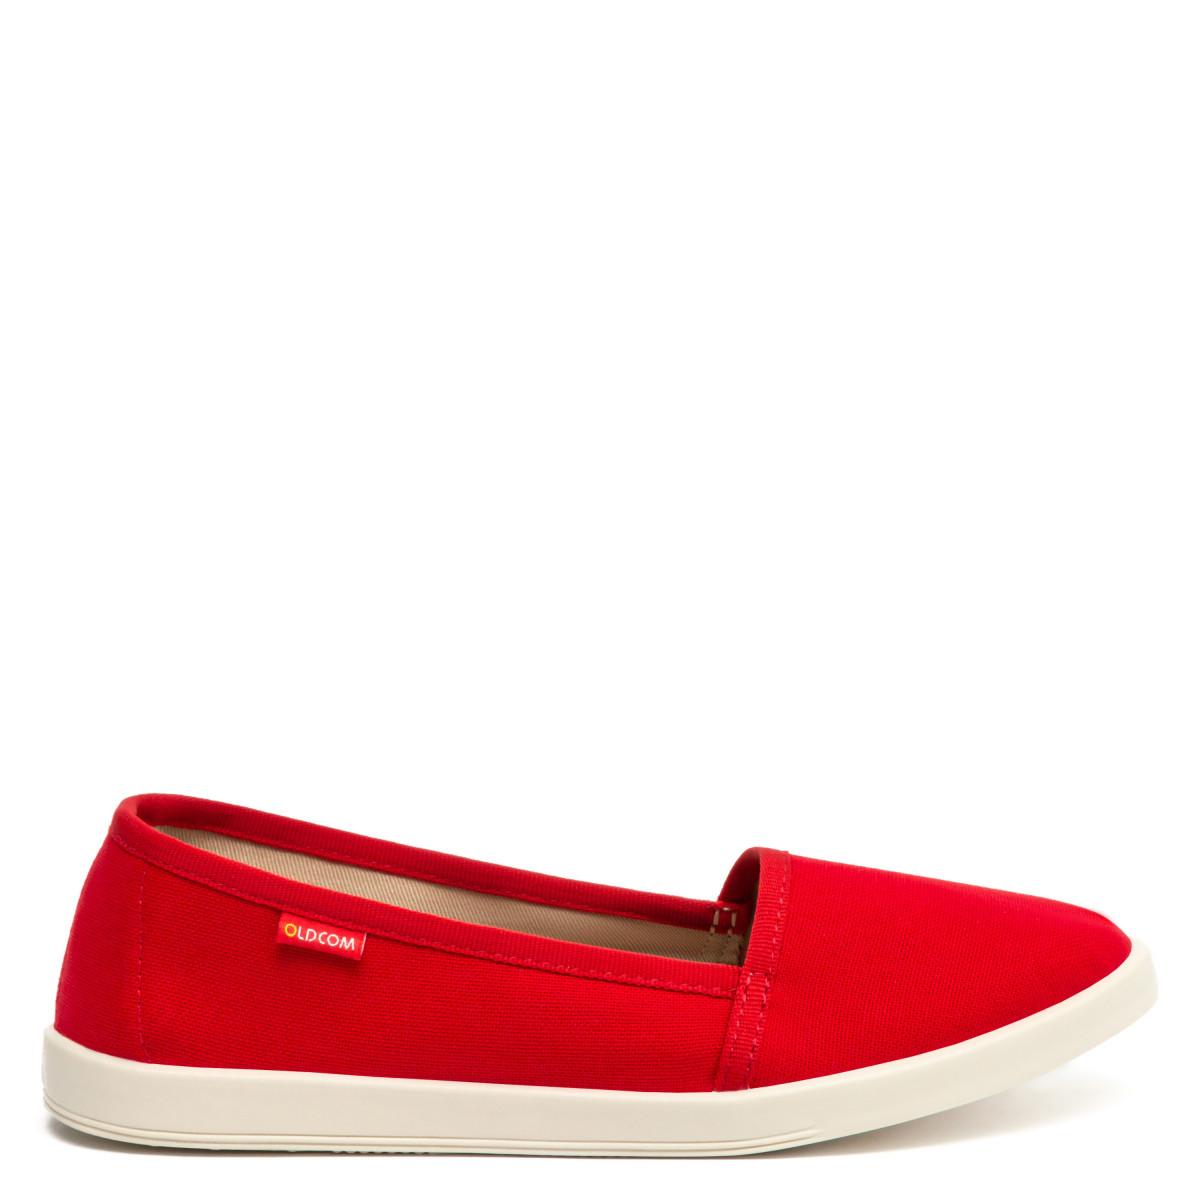 Espadrilles CANVAS, Red